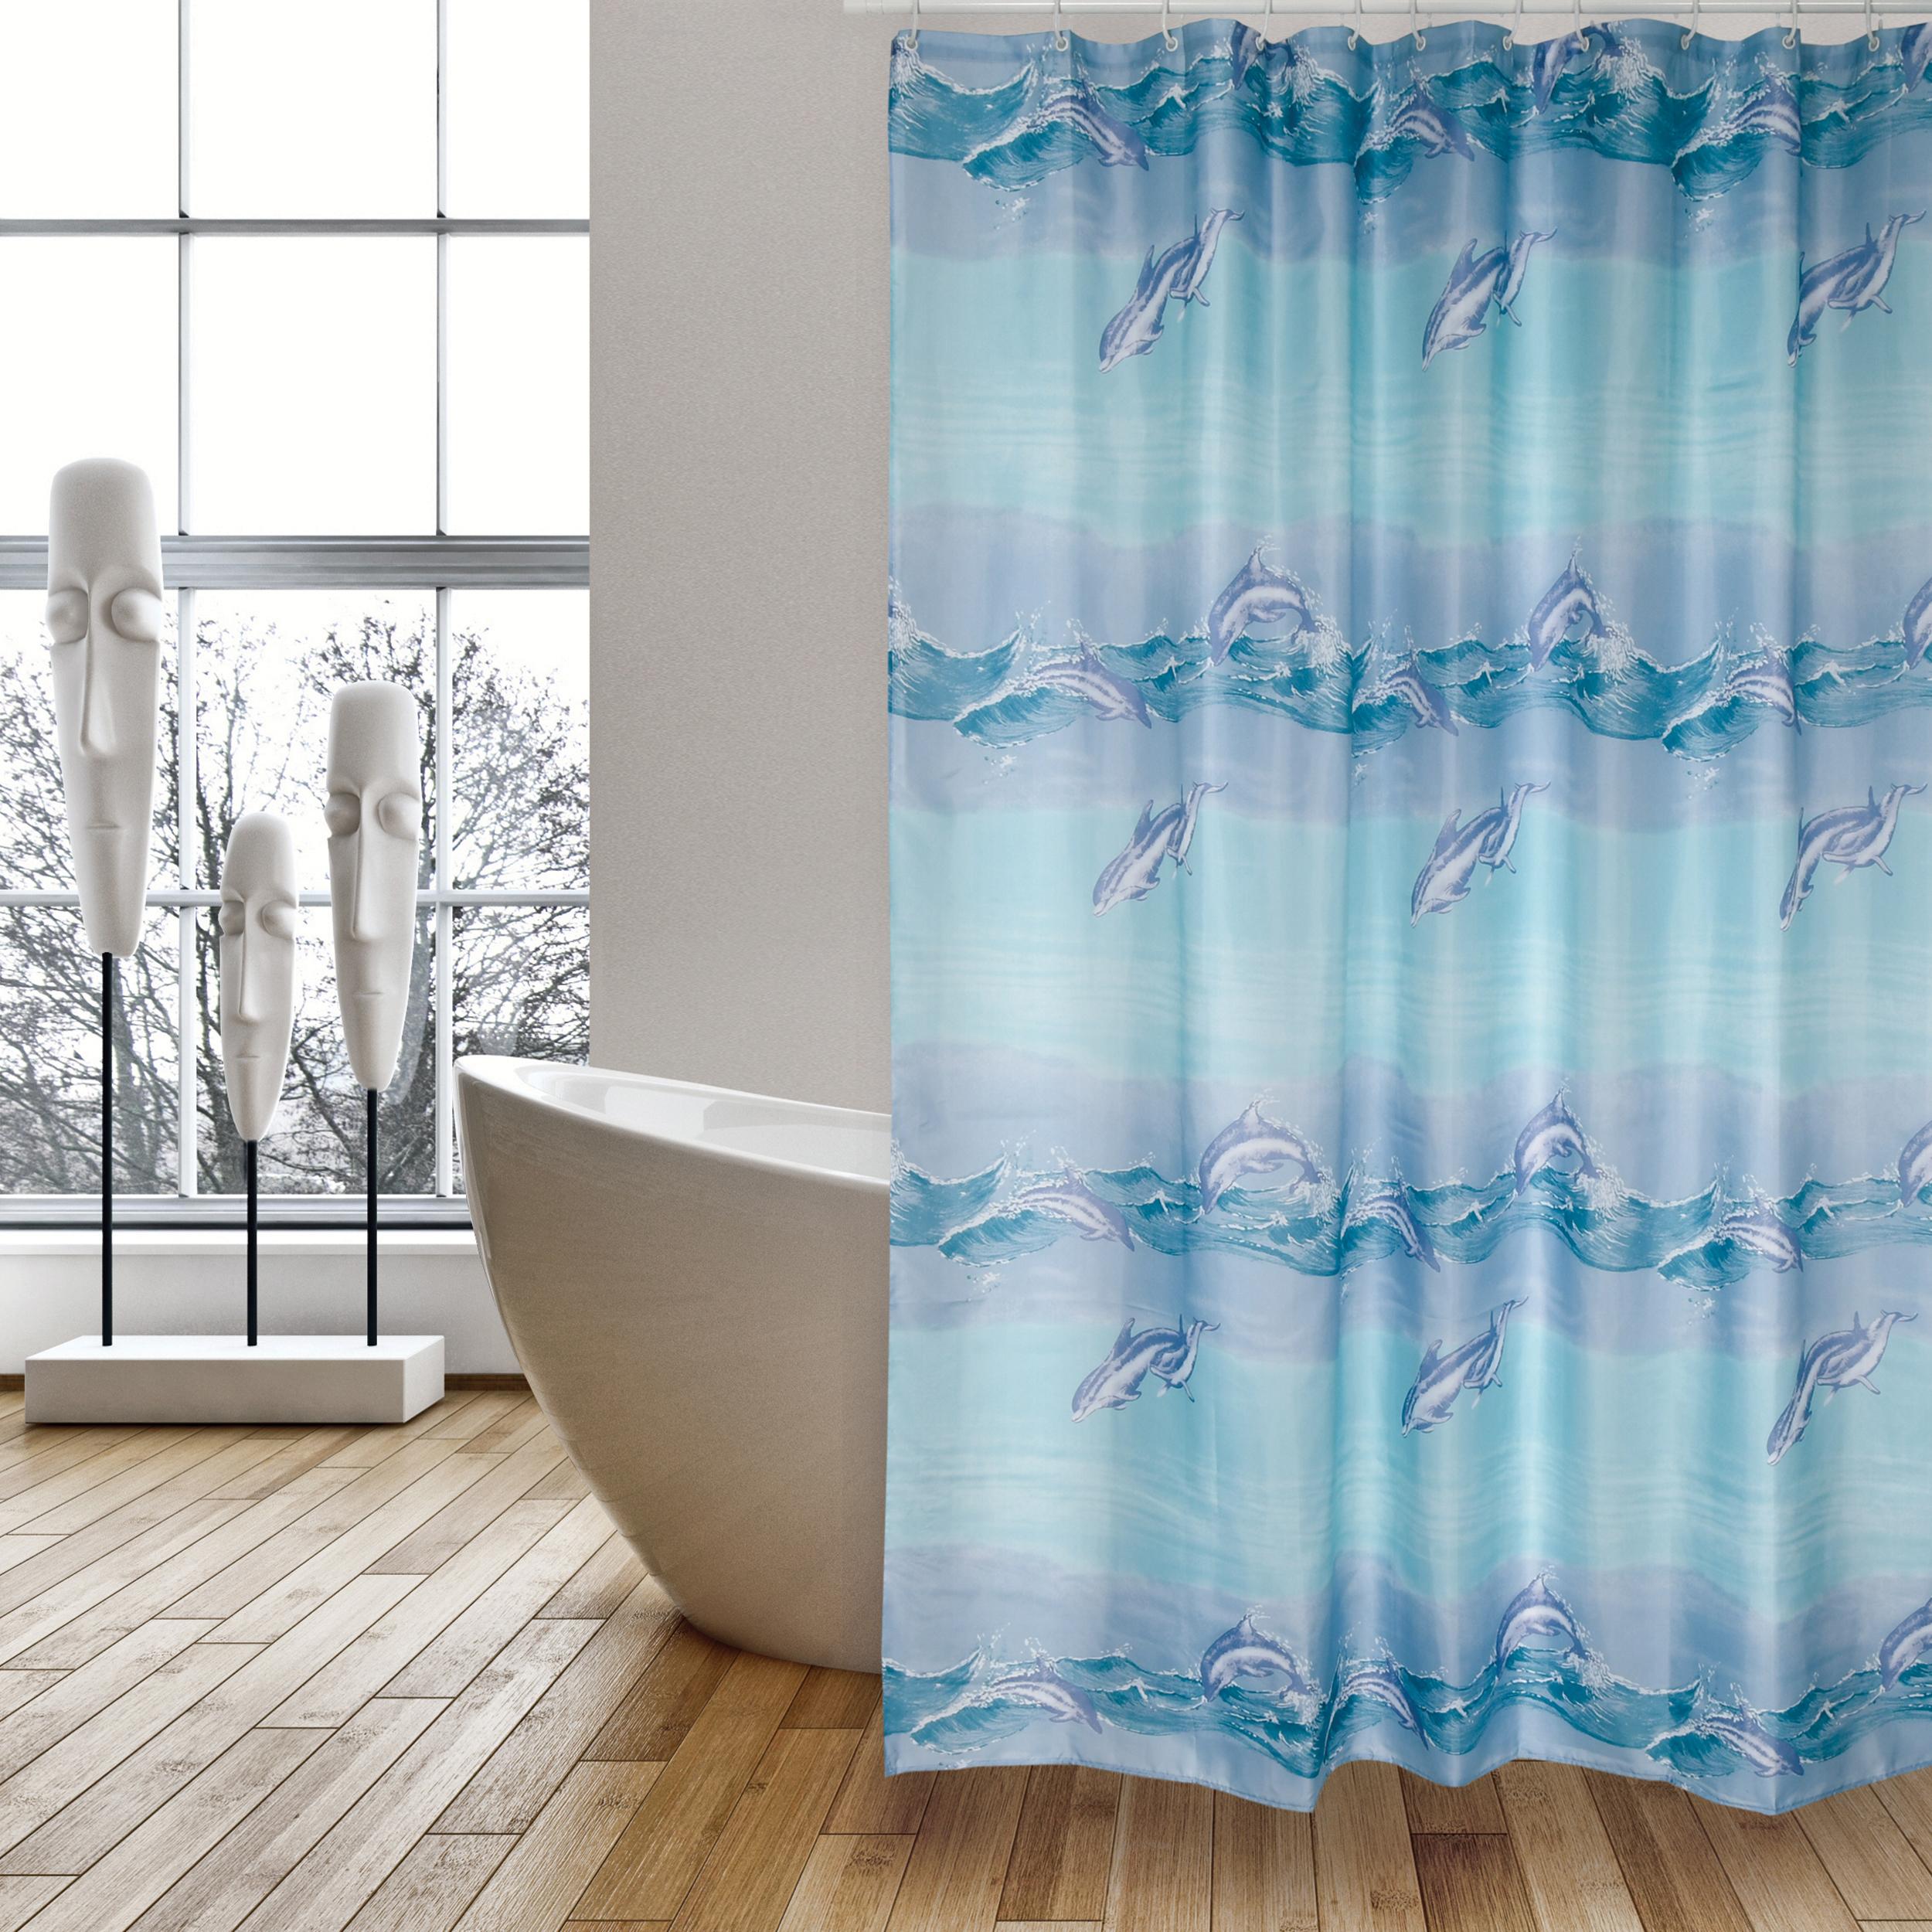 MSV Duschvorhang 180x200cm Anti Schimmel Textil Badewannenvorhang Wannenvorhang Delfine_2